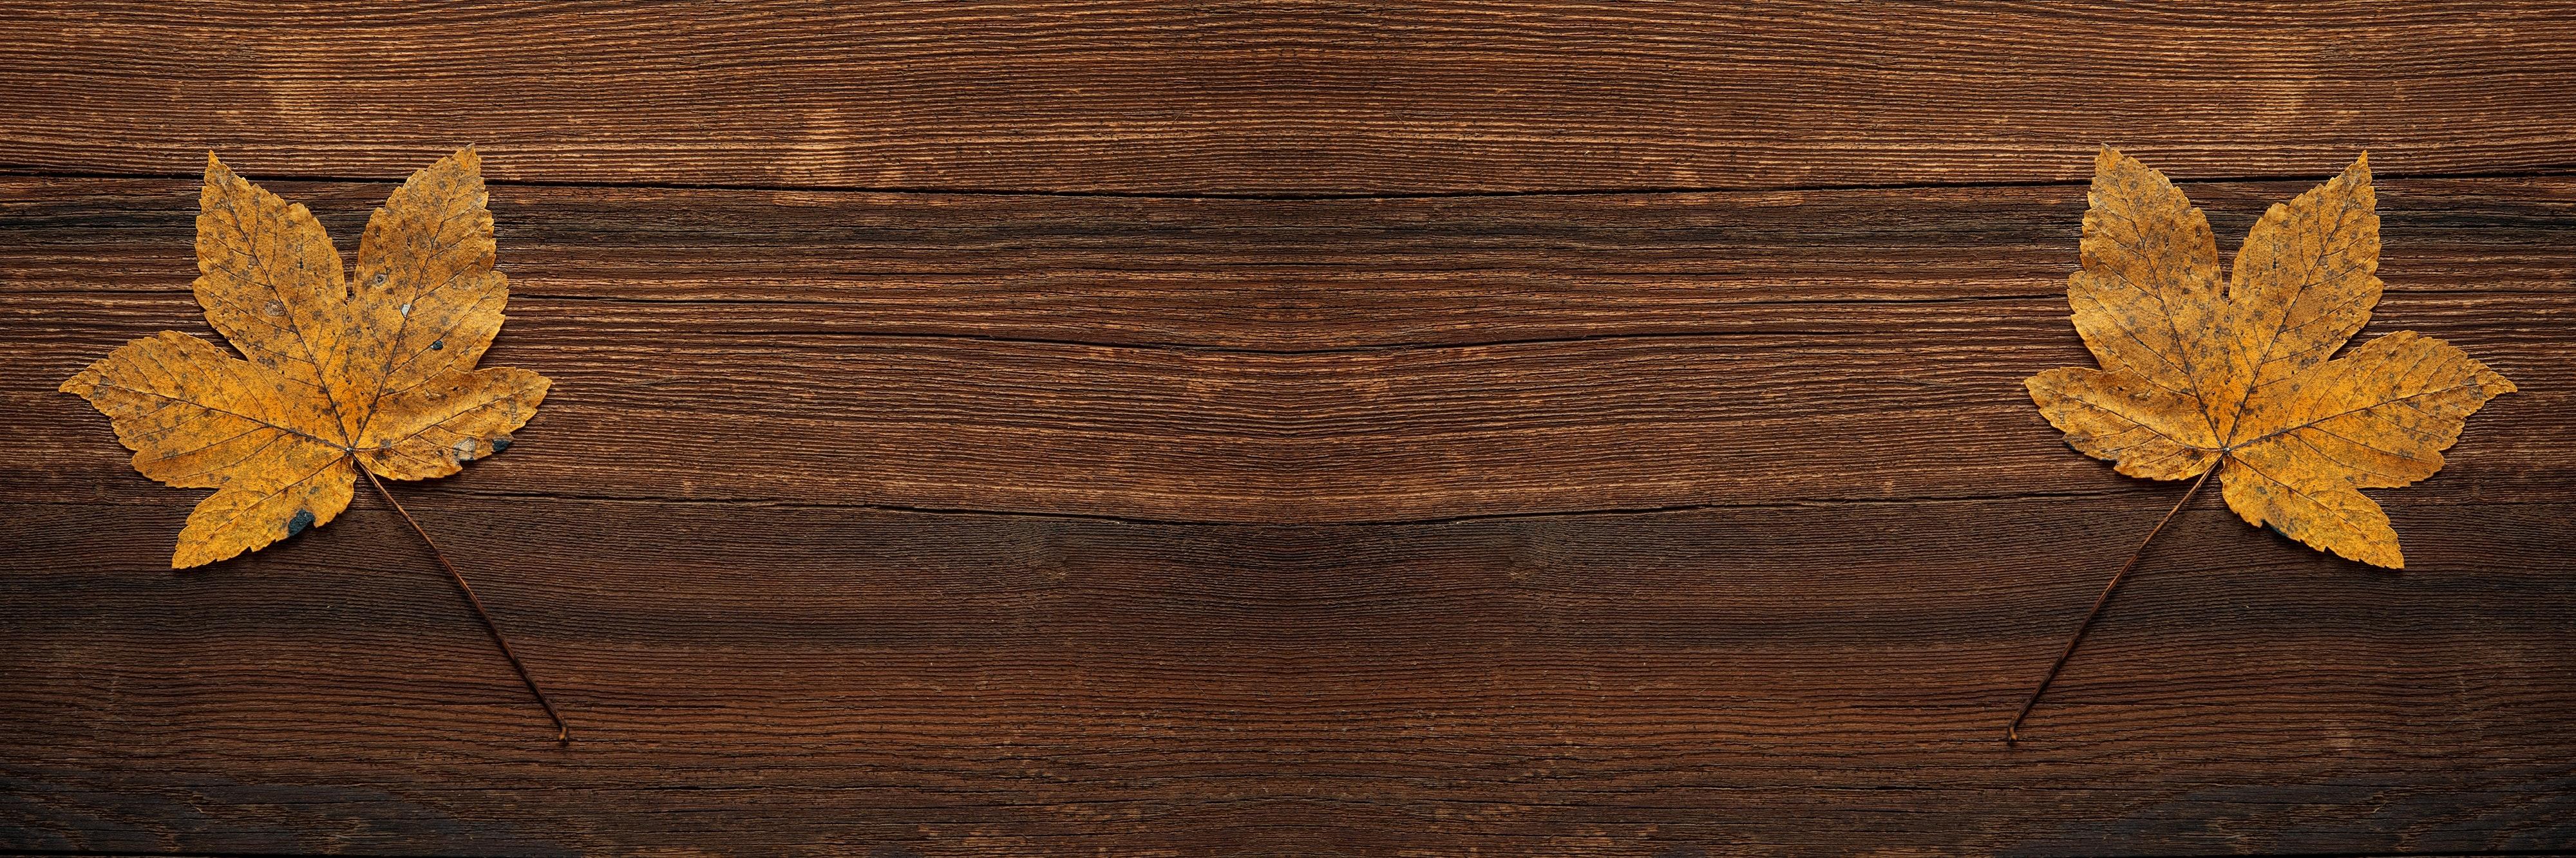 1000 Engaging Wood Background Photos 183 Pexels 183 Free